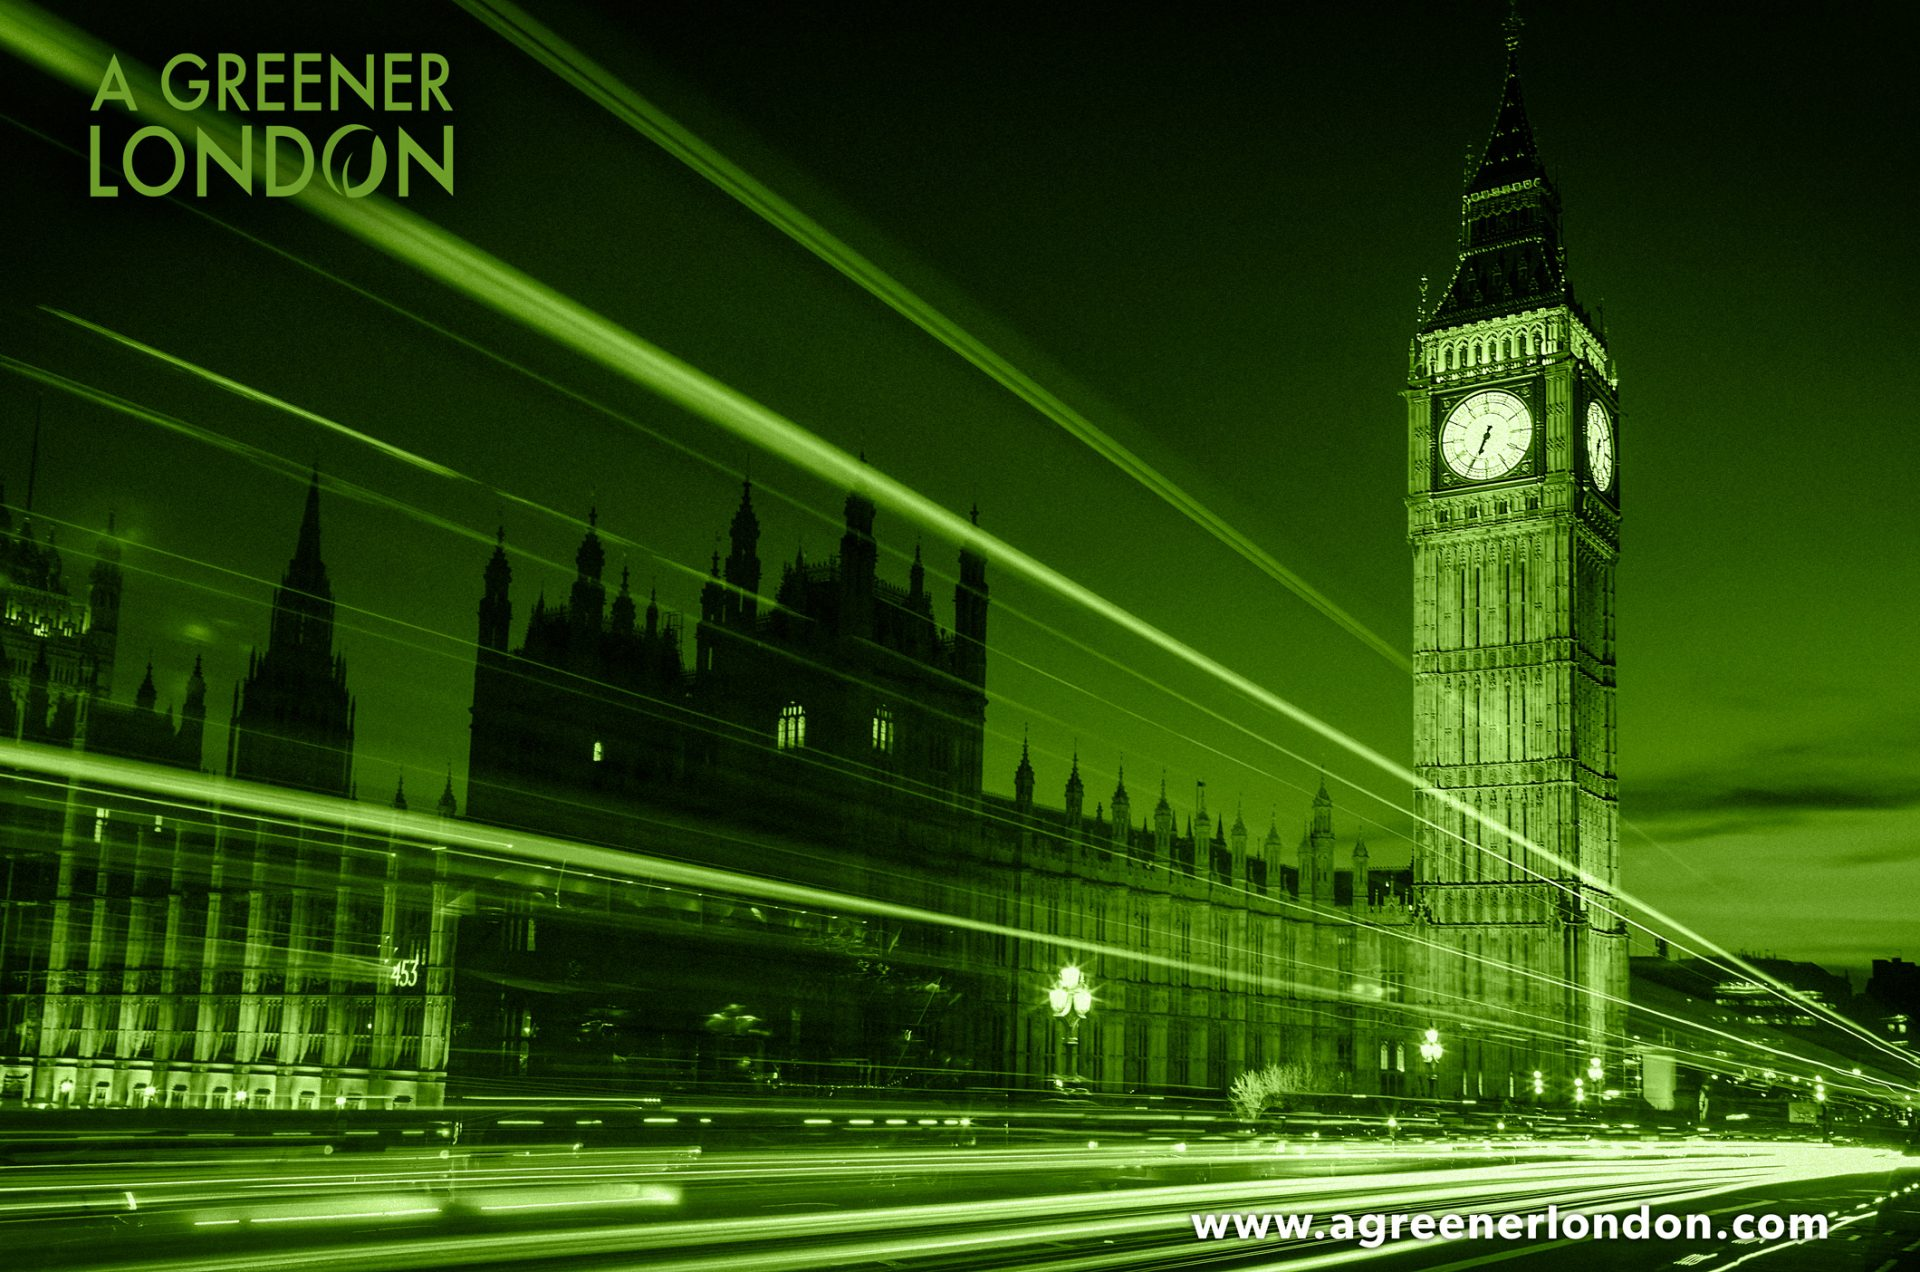 A Greener London